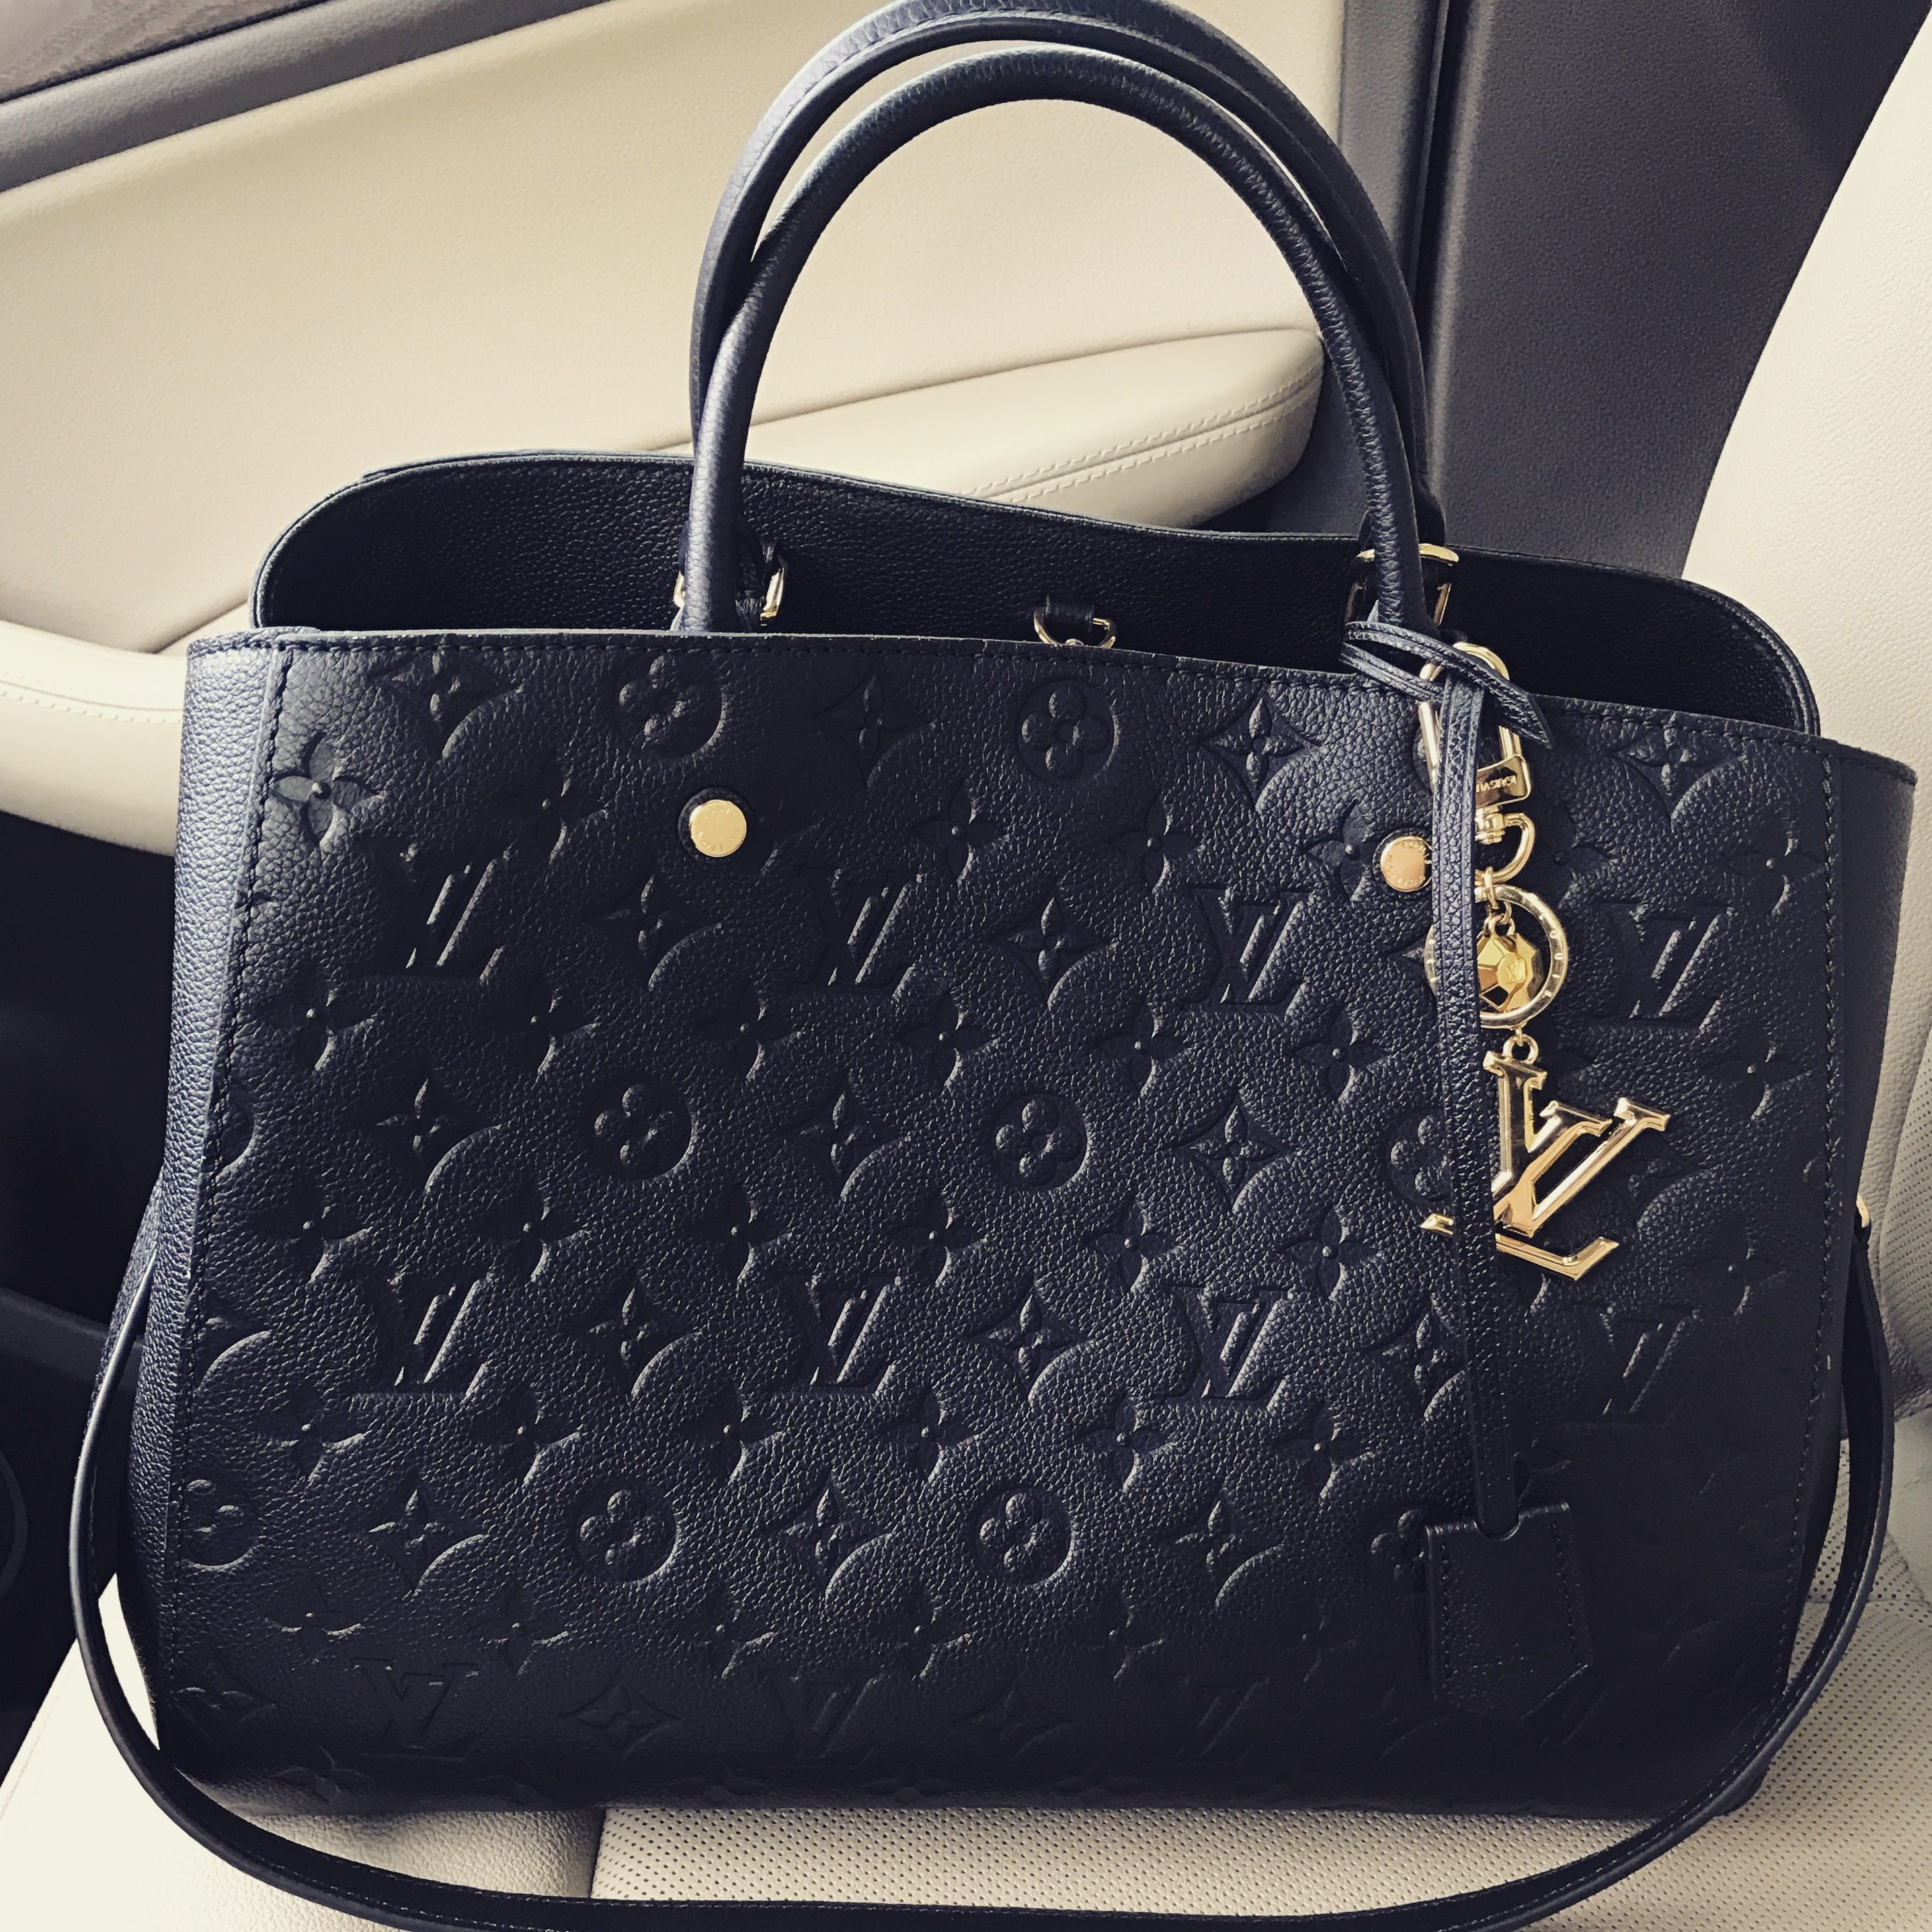 1f11369df1 Louis Vuitton Empreinte Montaigne GM Cartera Hermes